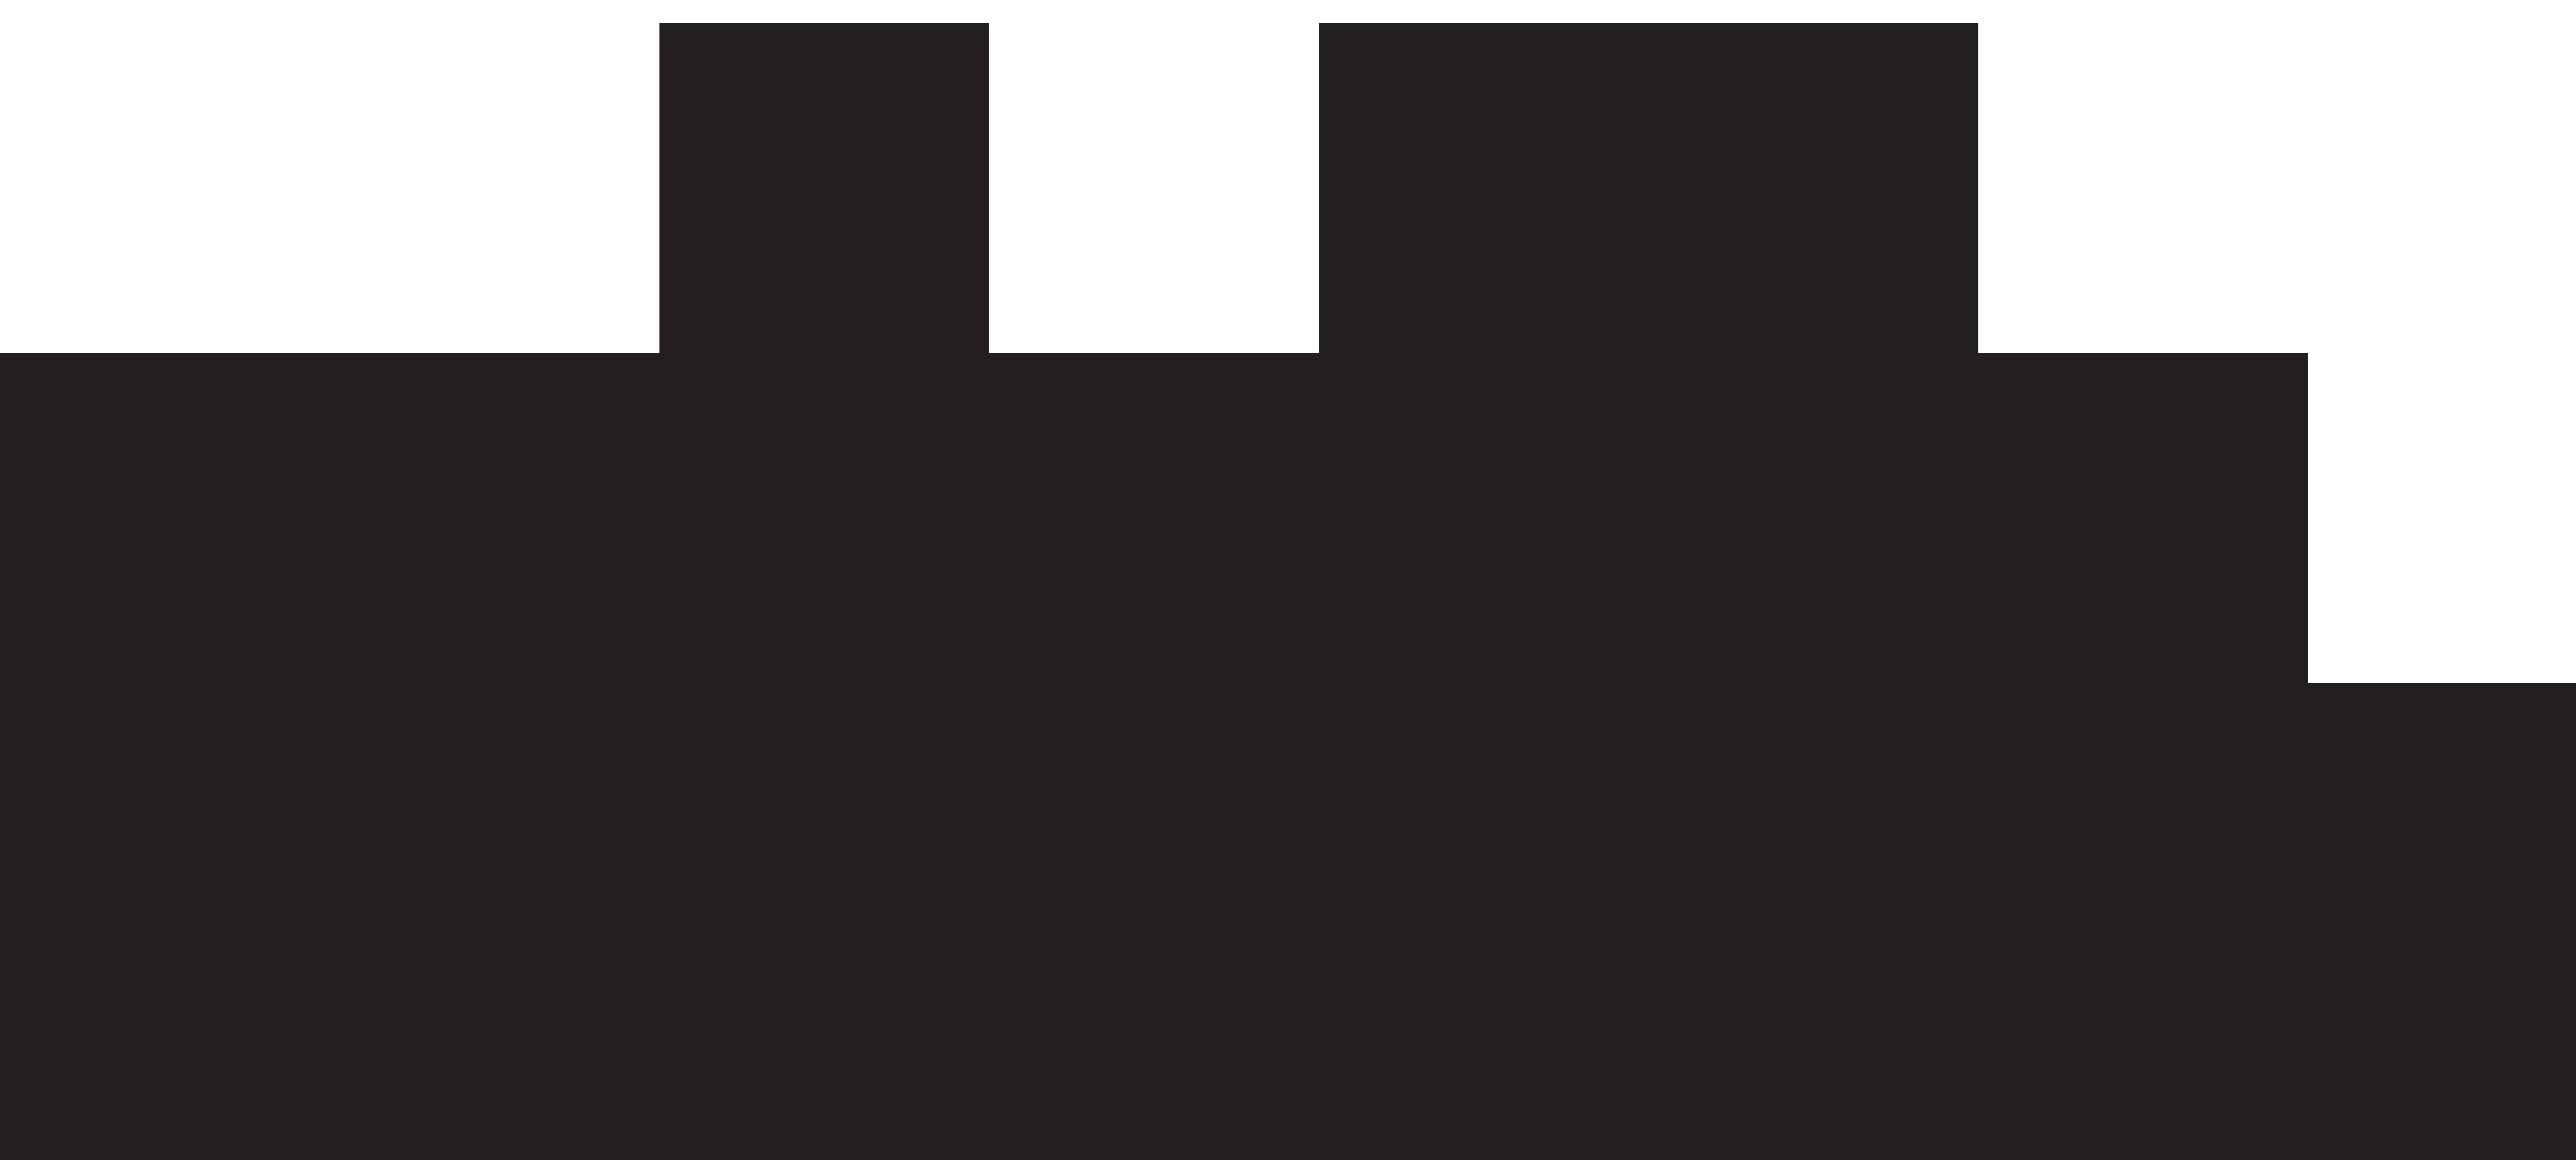 clip transparent Cityscape clipart big city. New york skyline silhouette.